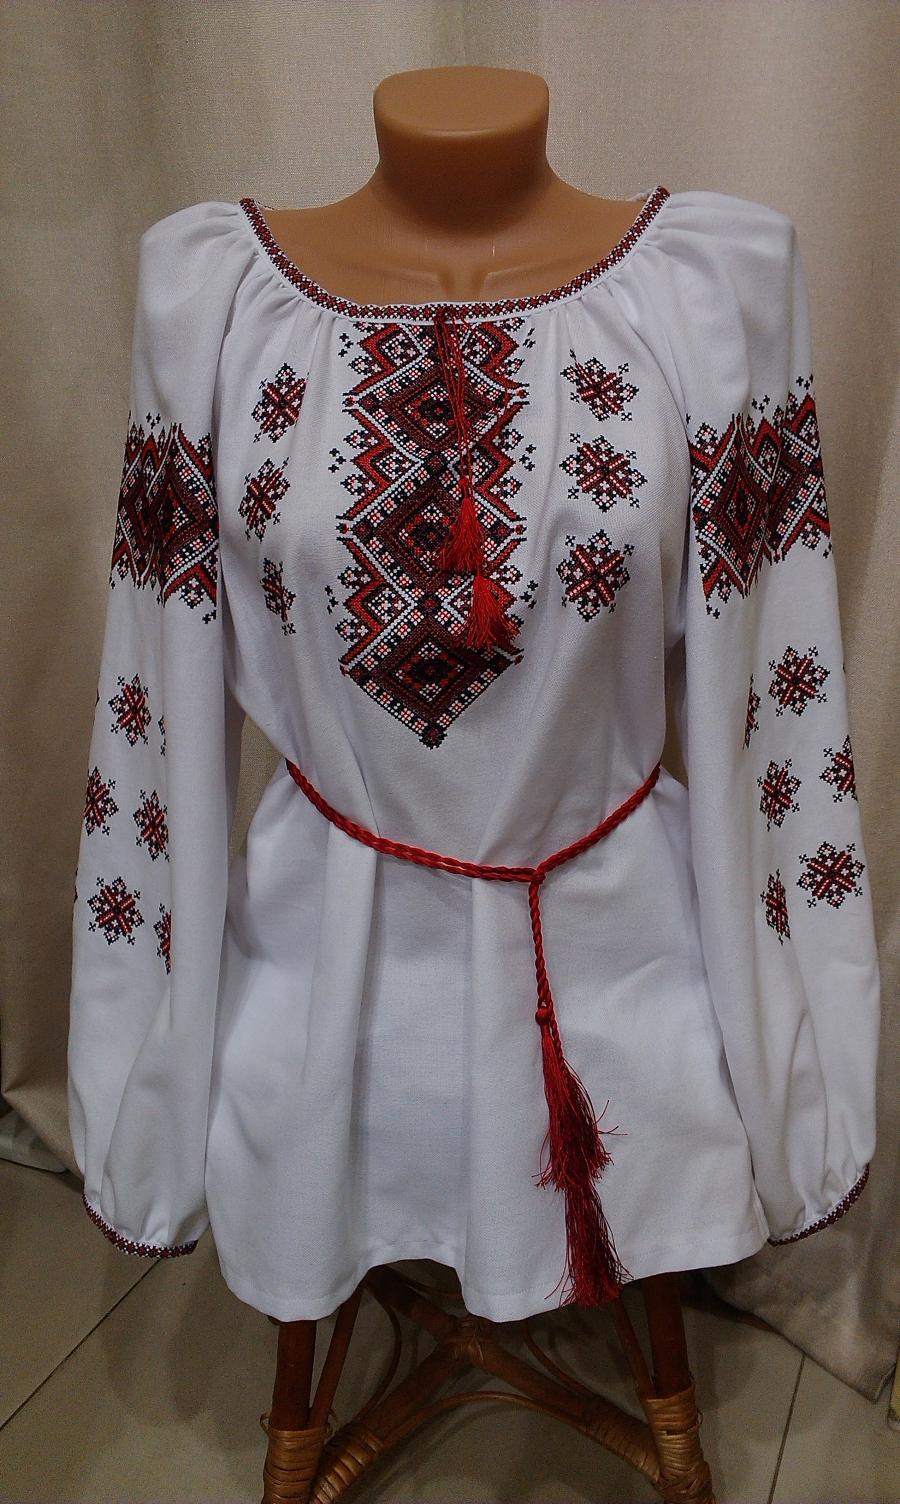 блузка хрестик домоткане полотно червоно-чорна. ціна  1000 грн ... 53ba548a1c368